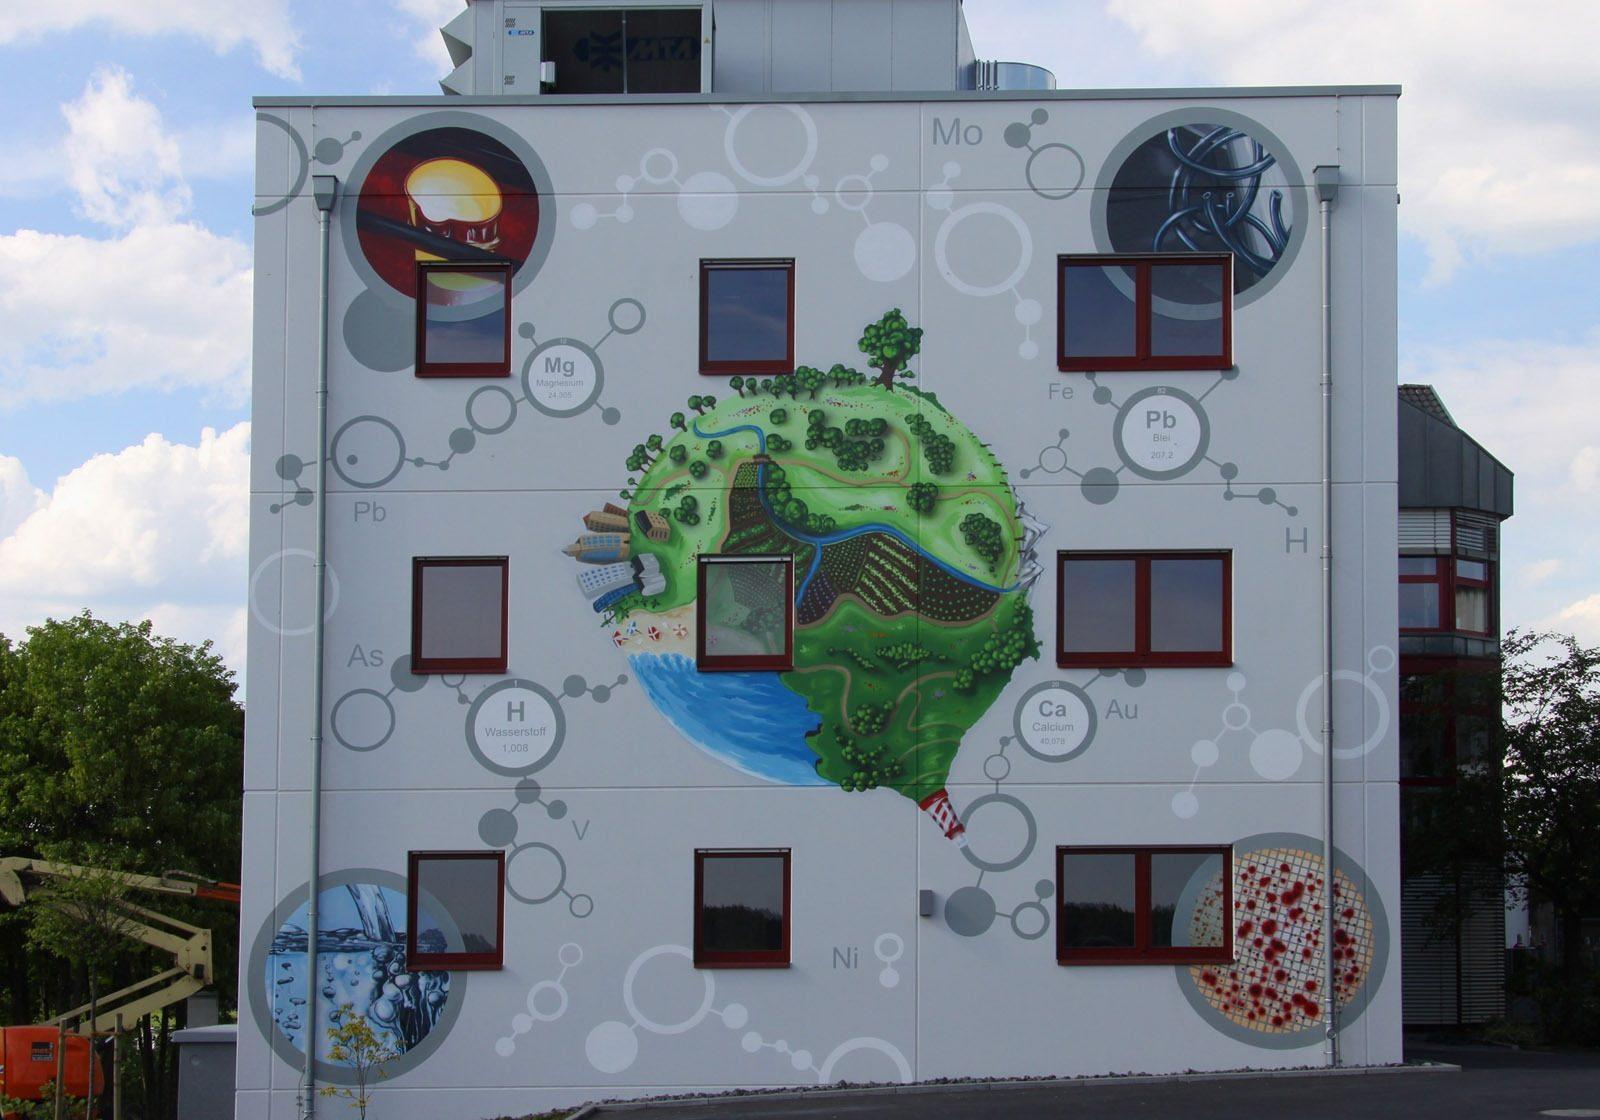 graffitiauftrag-graffitikuenstler-artmos4-umweltlabor-horn-erdkugel-grafik